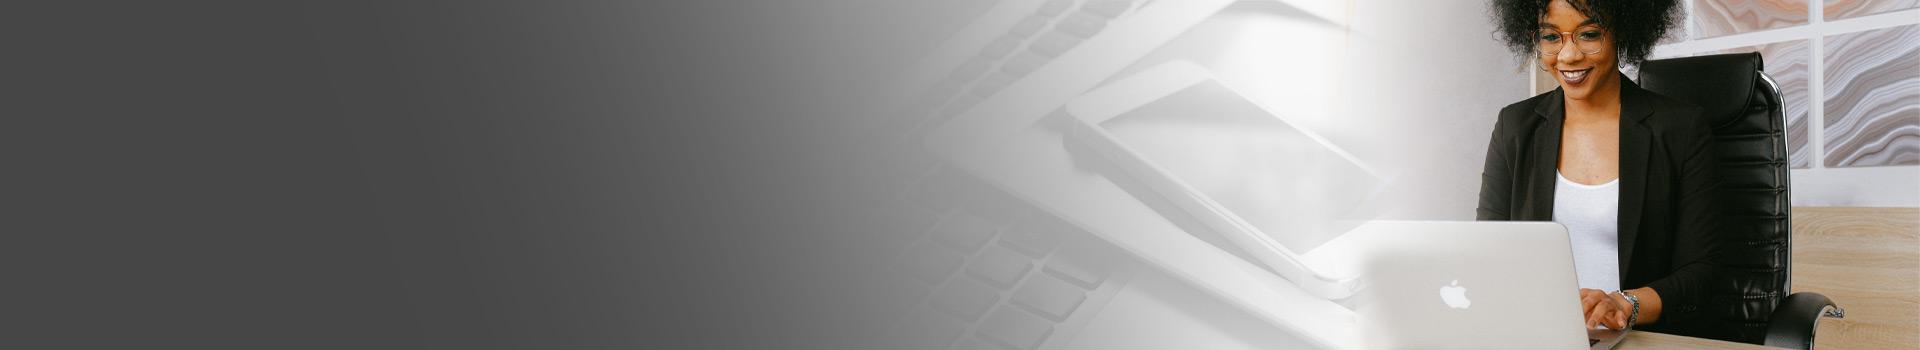 masthead-webinar-training_1920x350